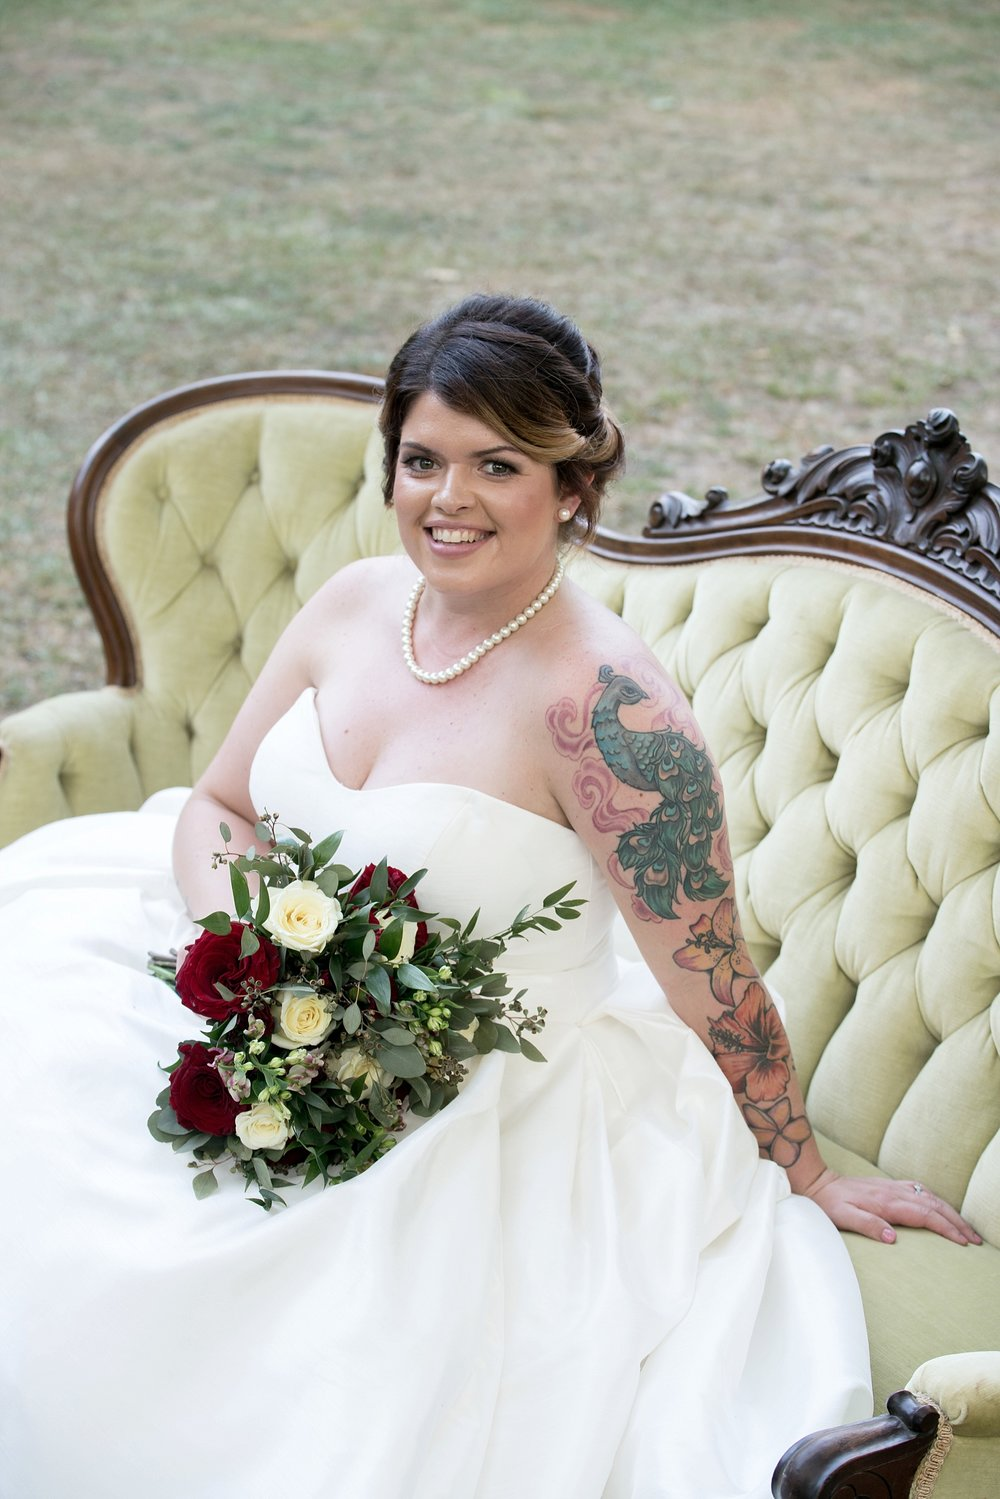 Longstraw-Farms-Wedding-Photographer-058.jpg